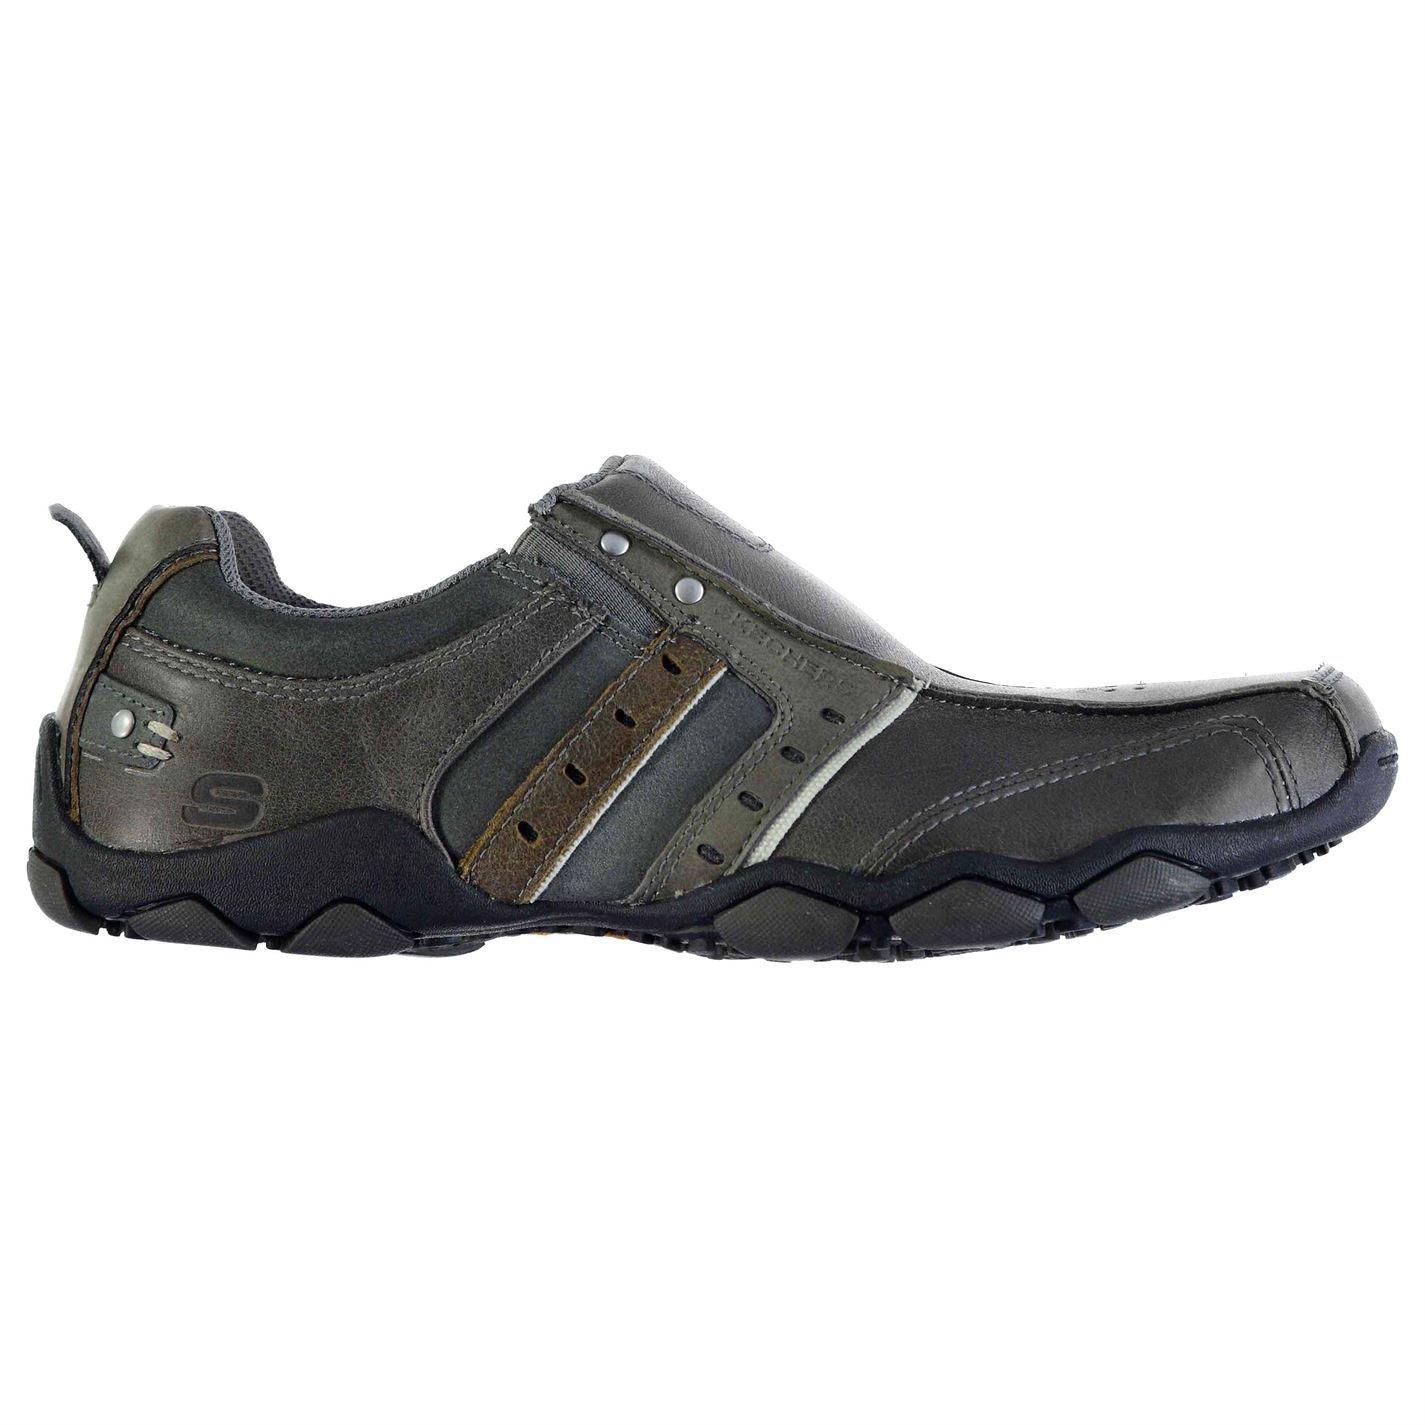 Skechers Contrast  Uomo Diam Heism Contrast Skechers Panelling Slip On Flats Casual Schuhes eadf18